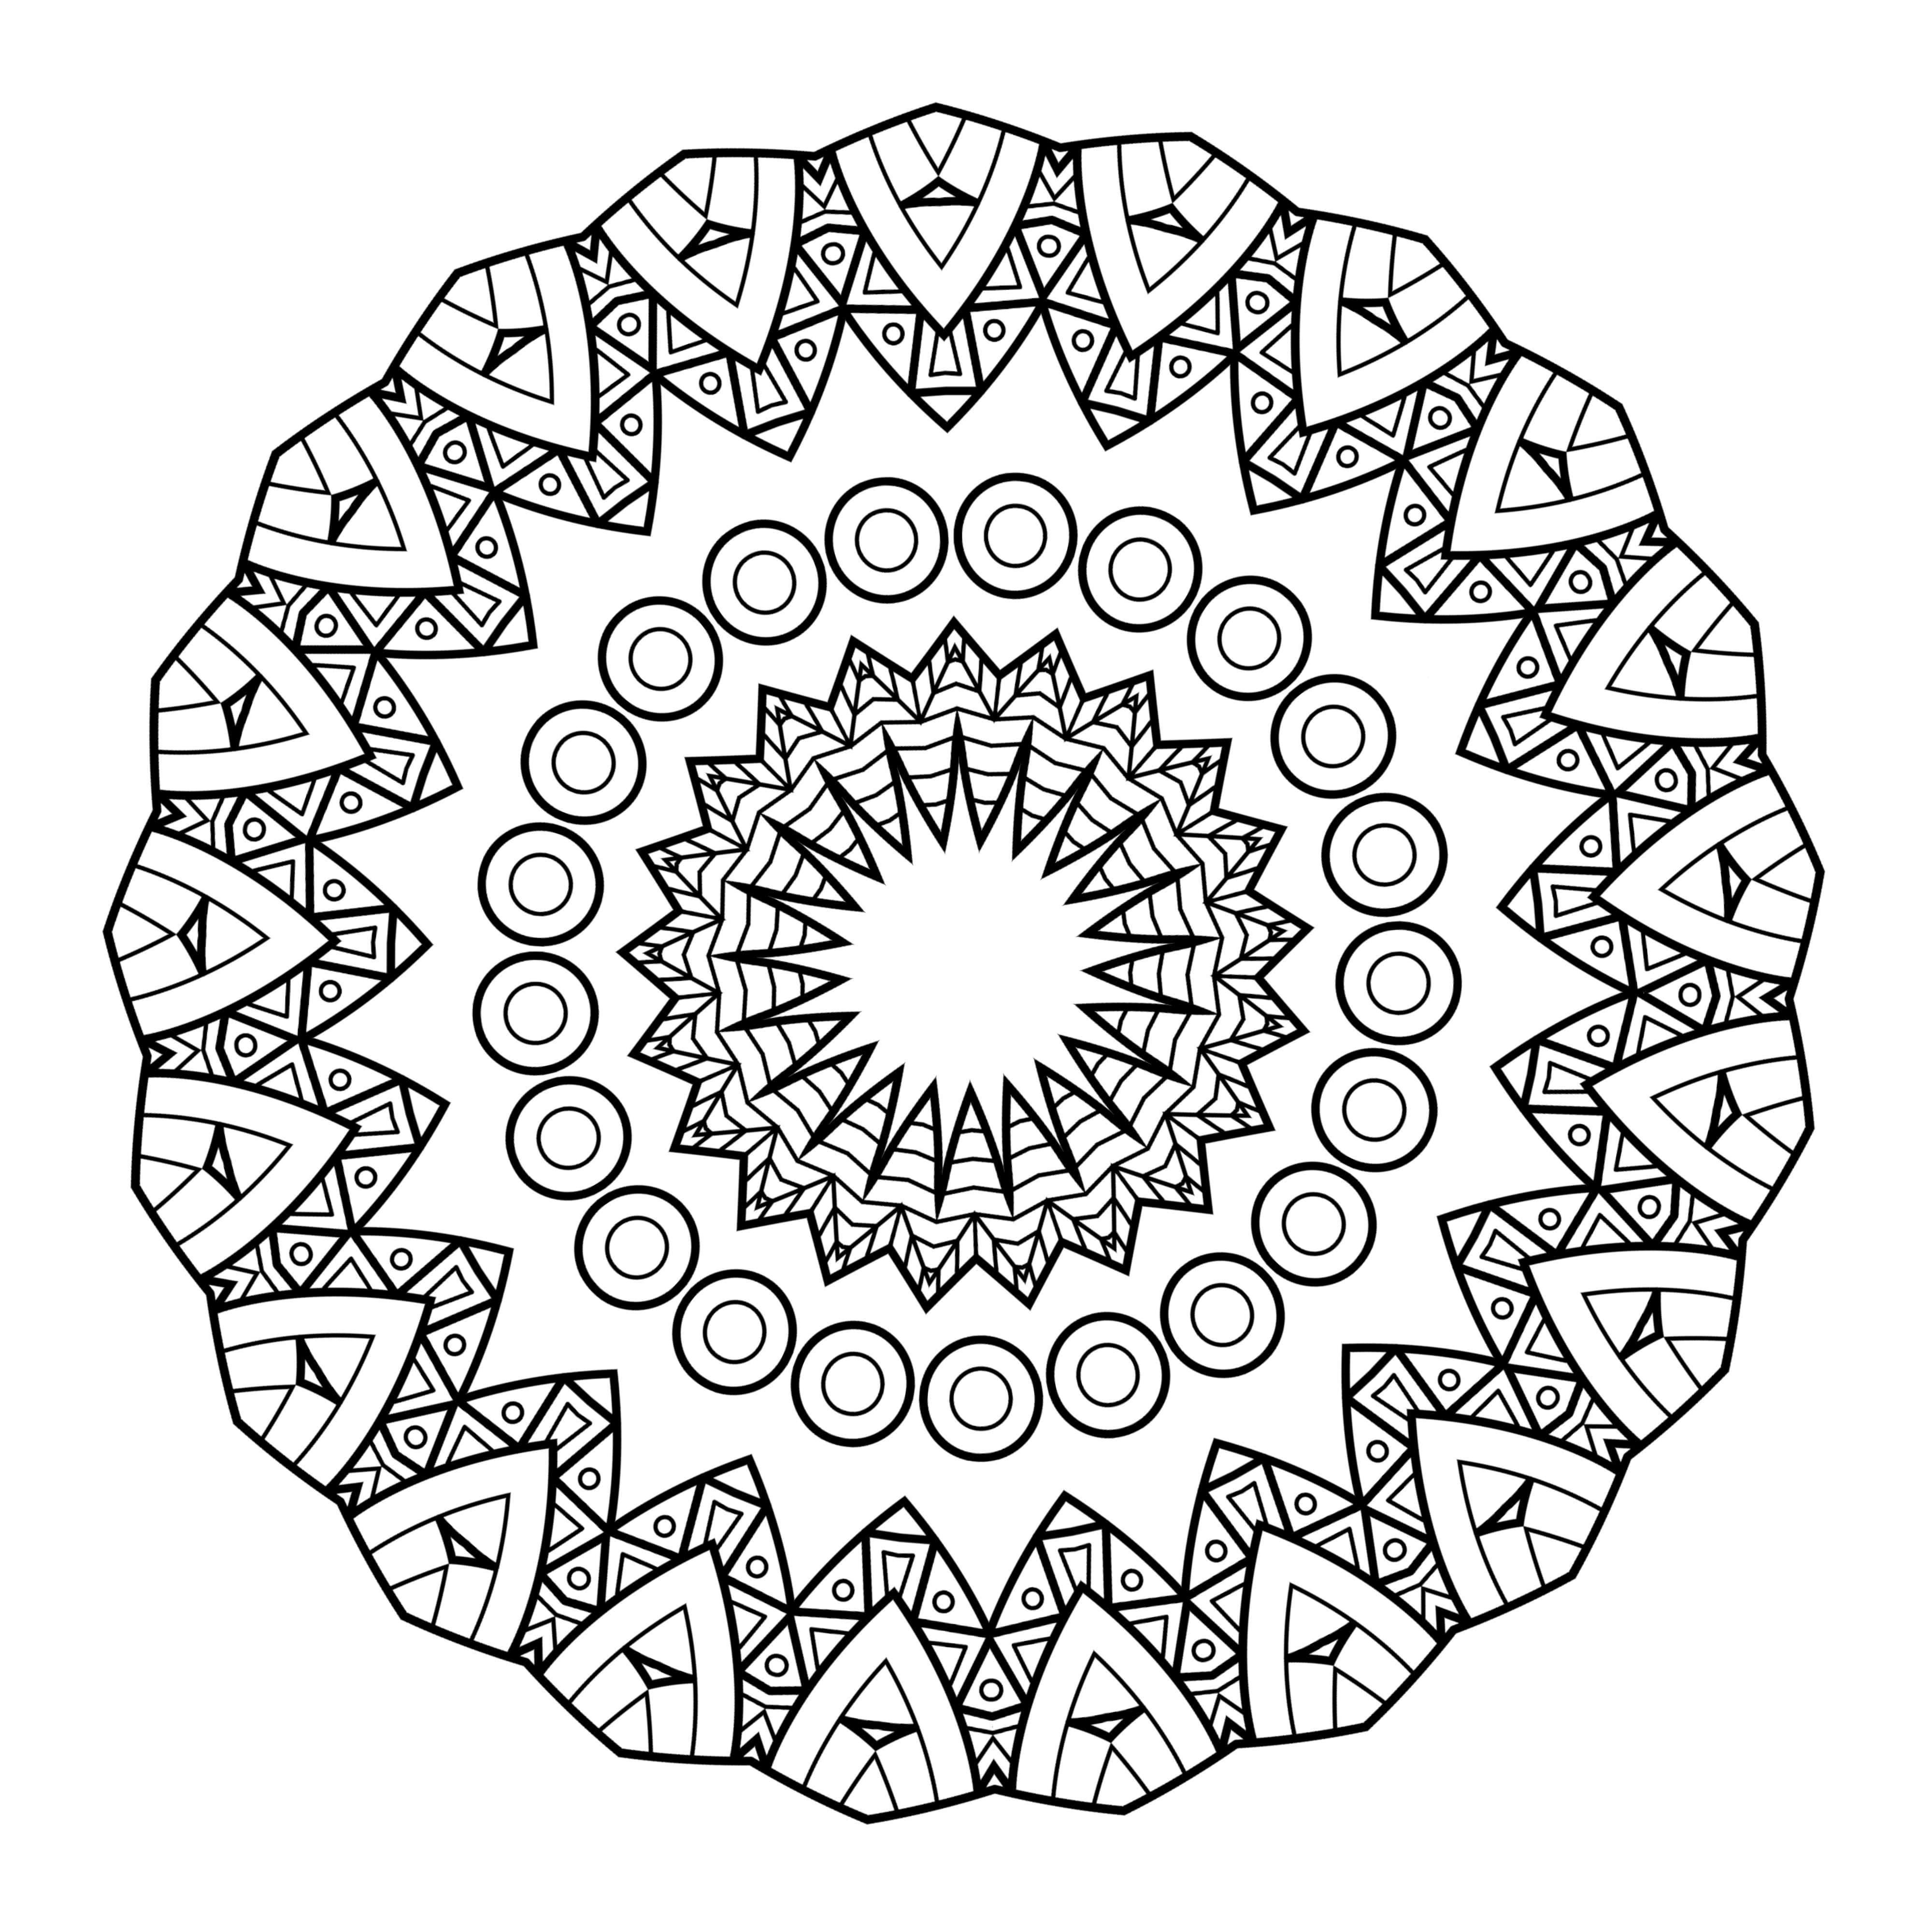 This is an image of Priceless Free Printable Mandalas